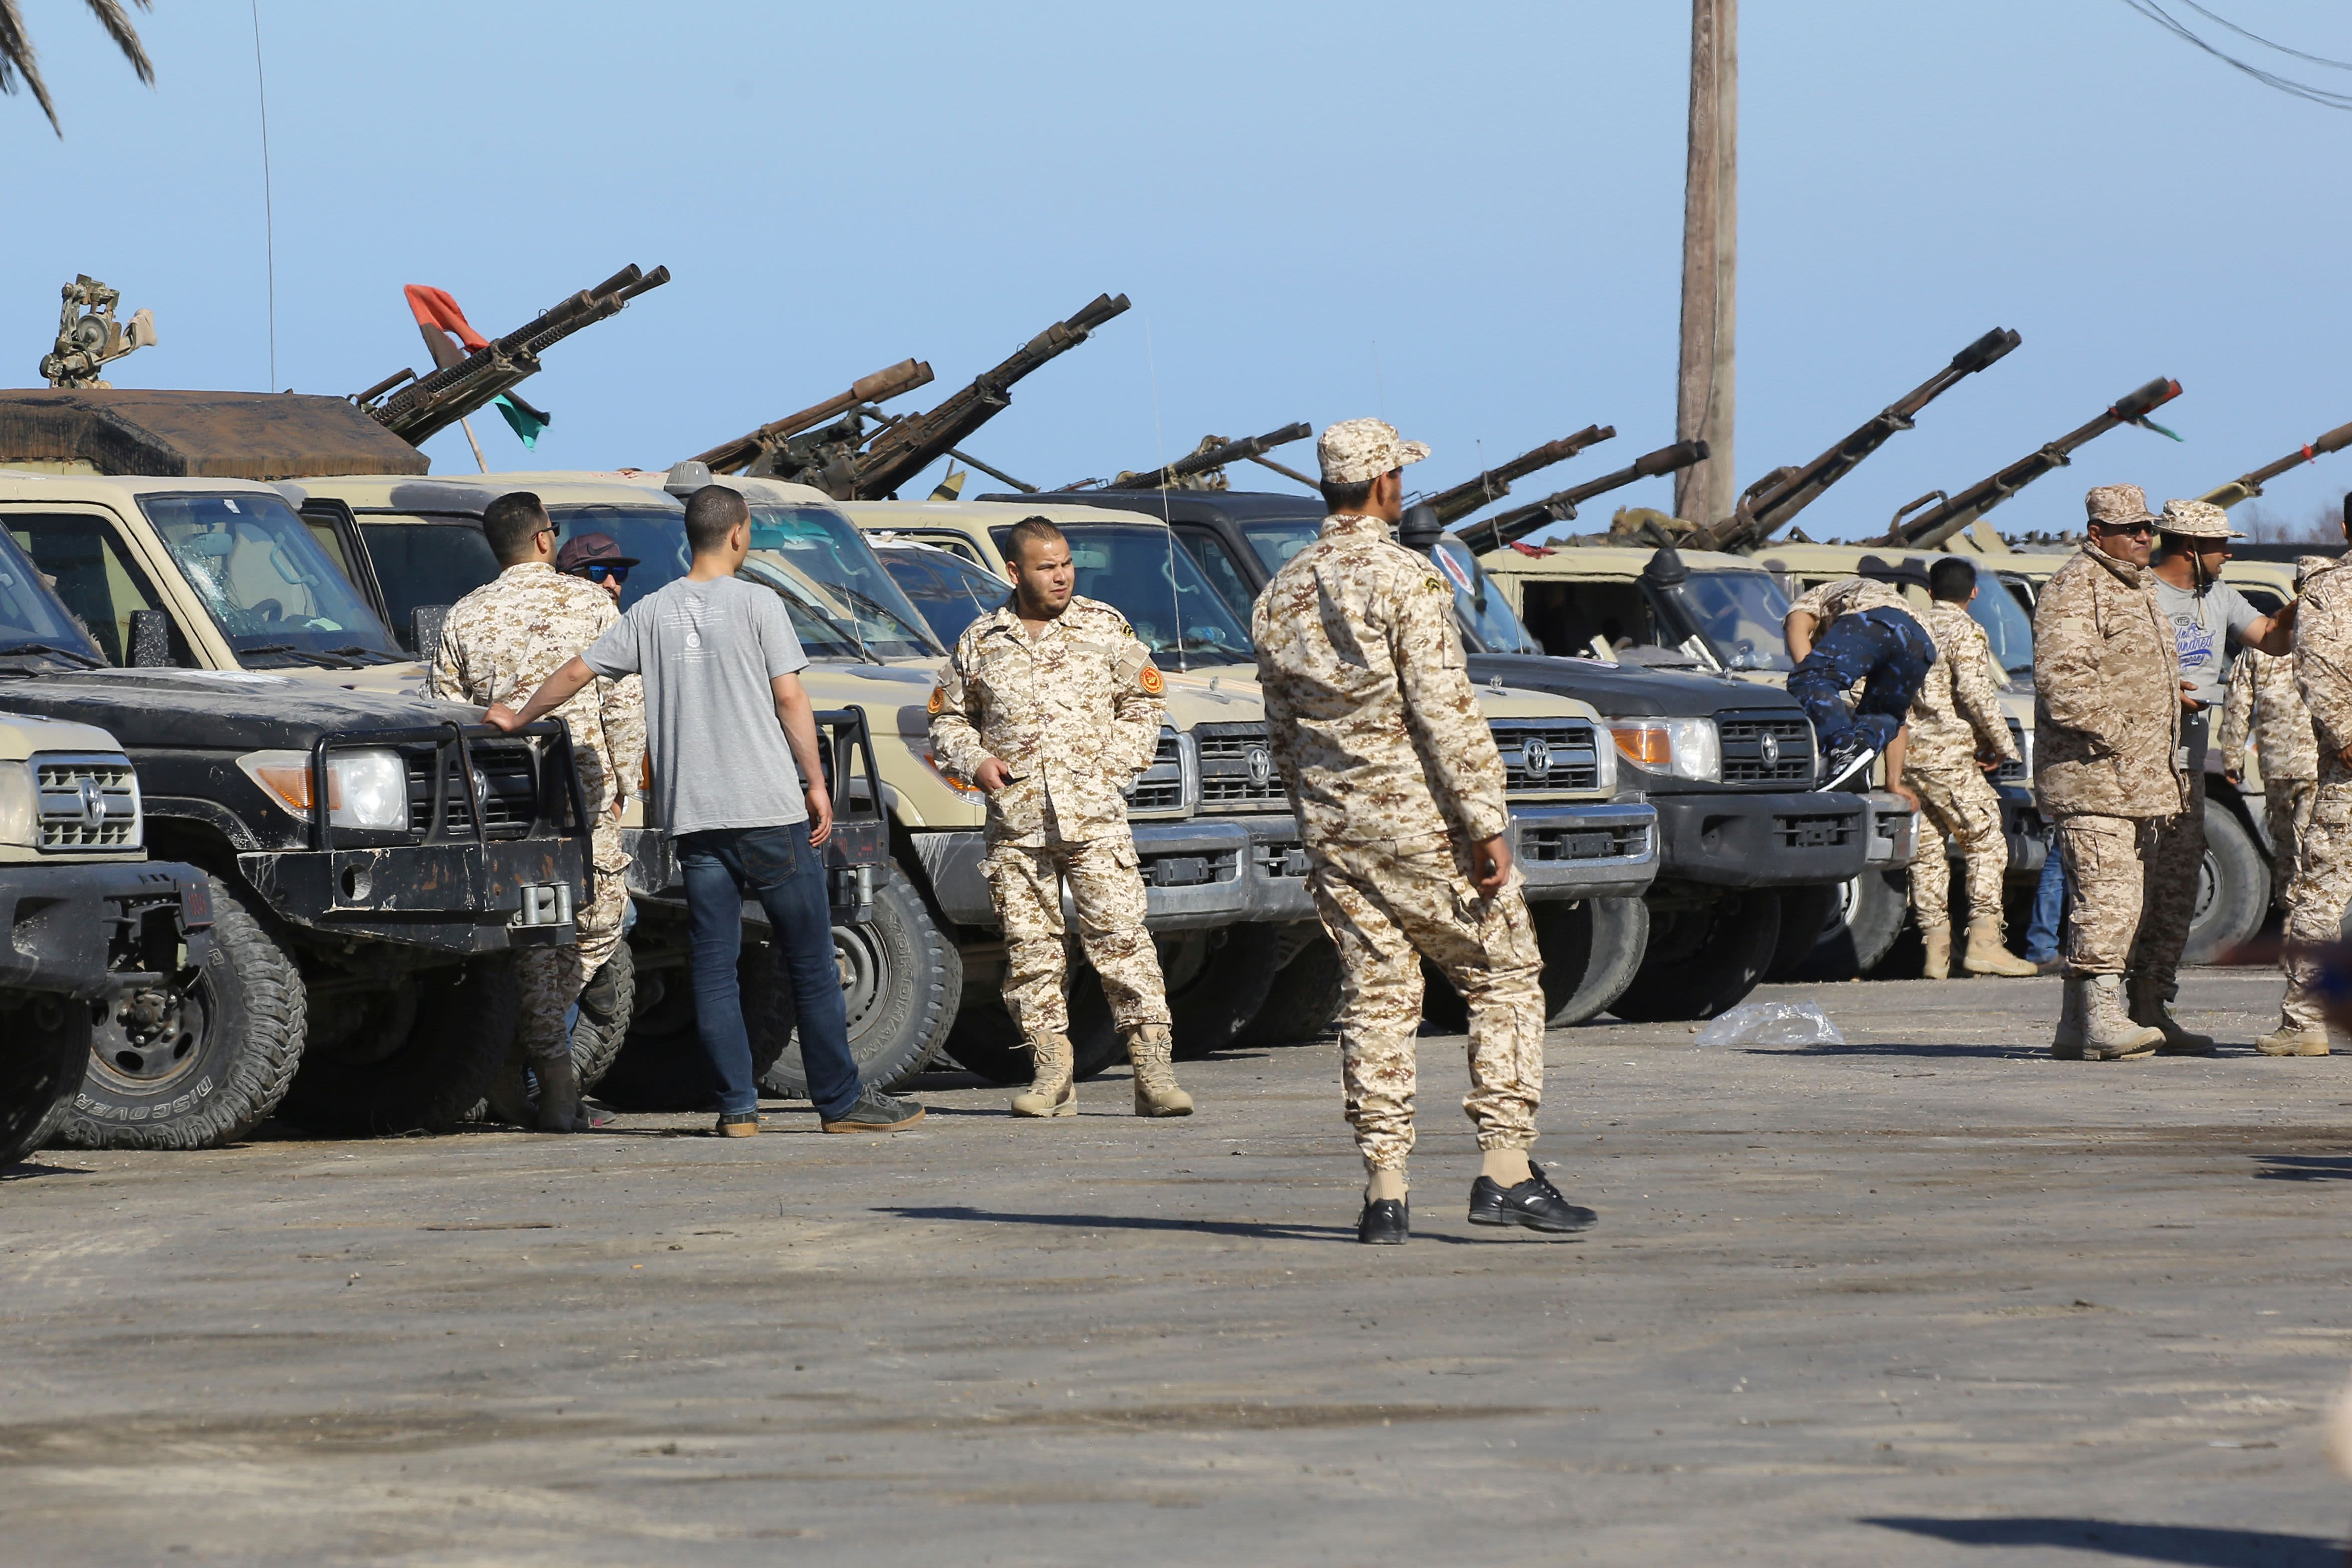 Russian mercenaries, a CIA-linked general and lots of oil: Explaining Libya's war